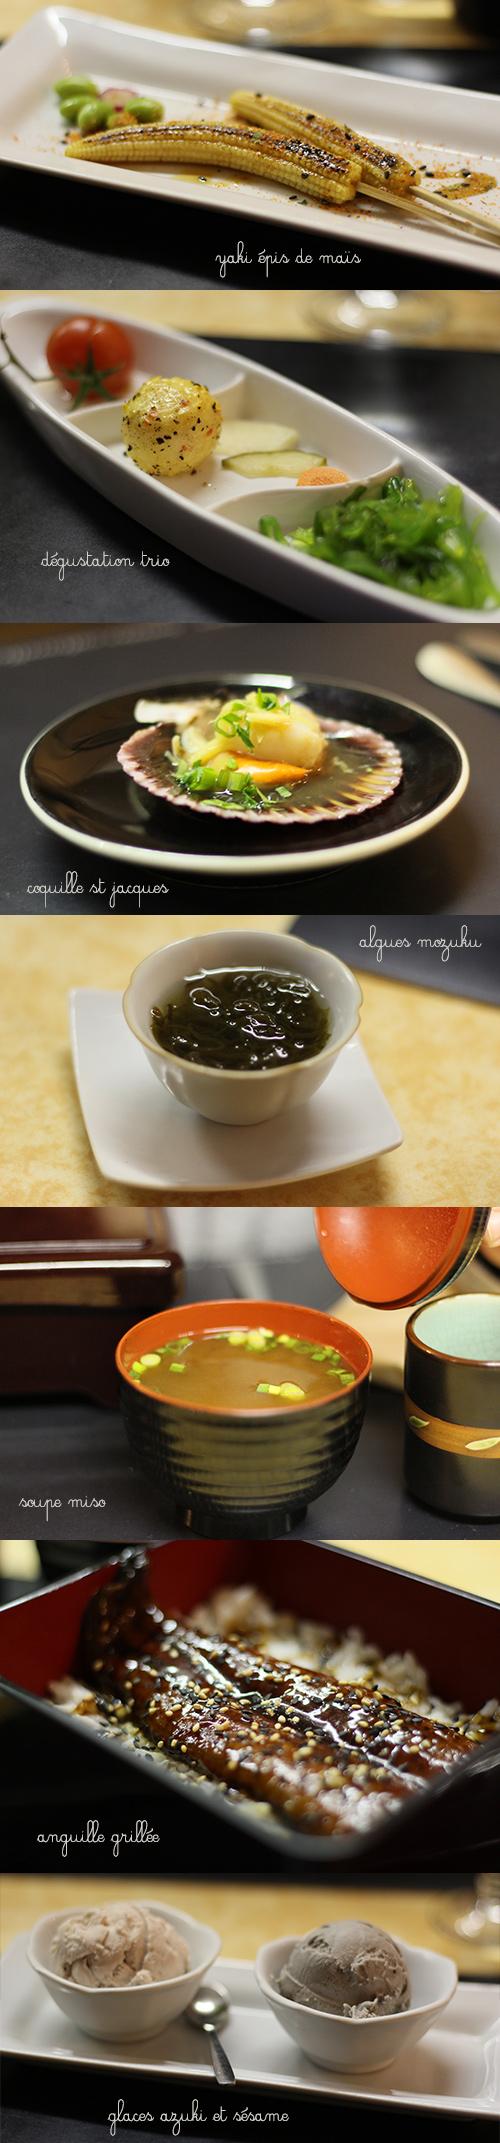 menu-anguille